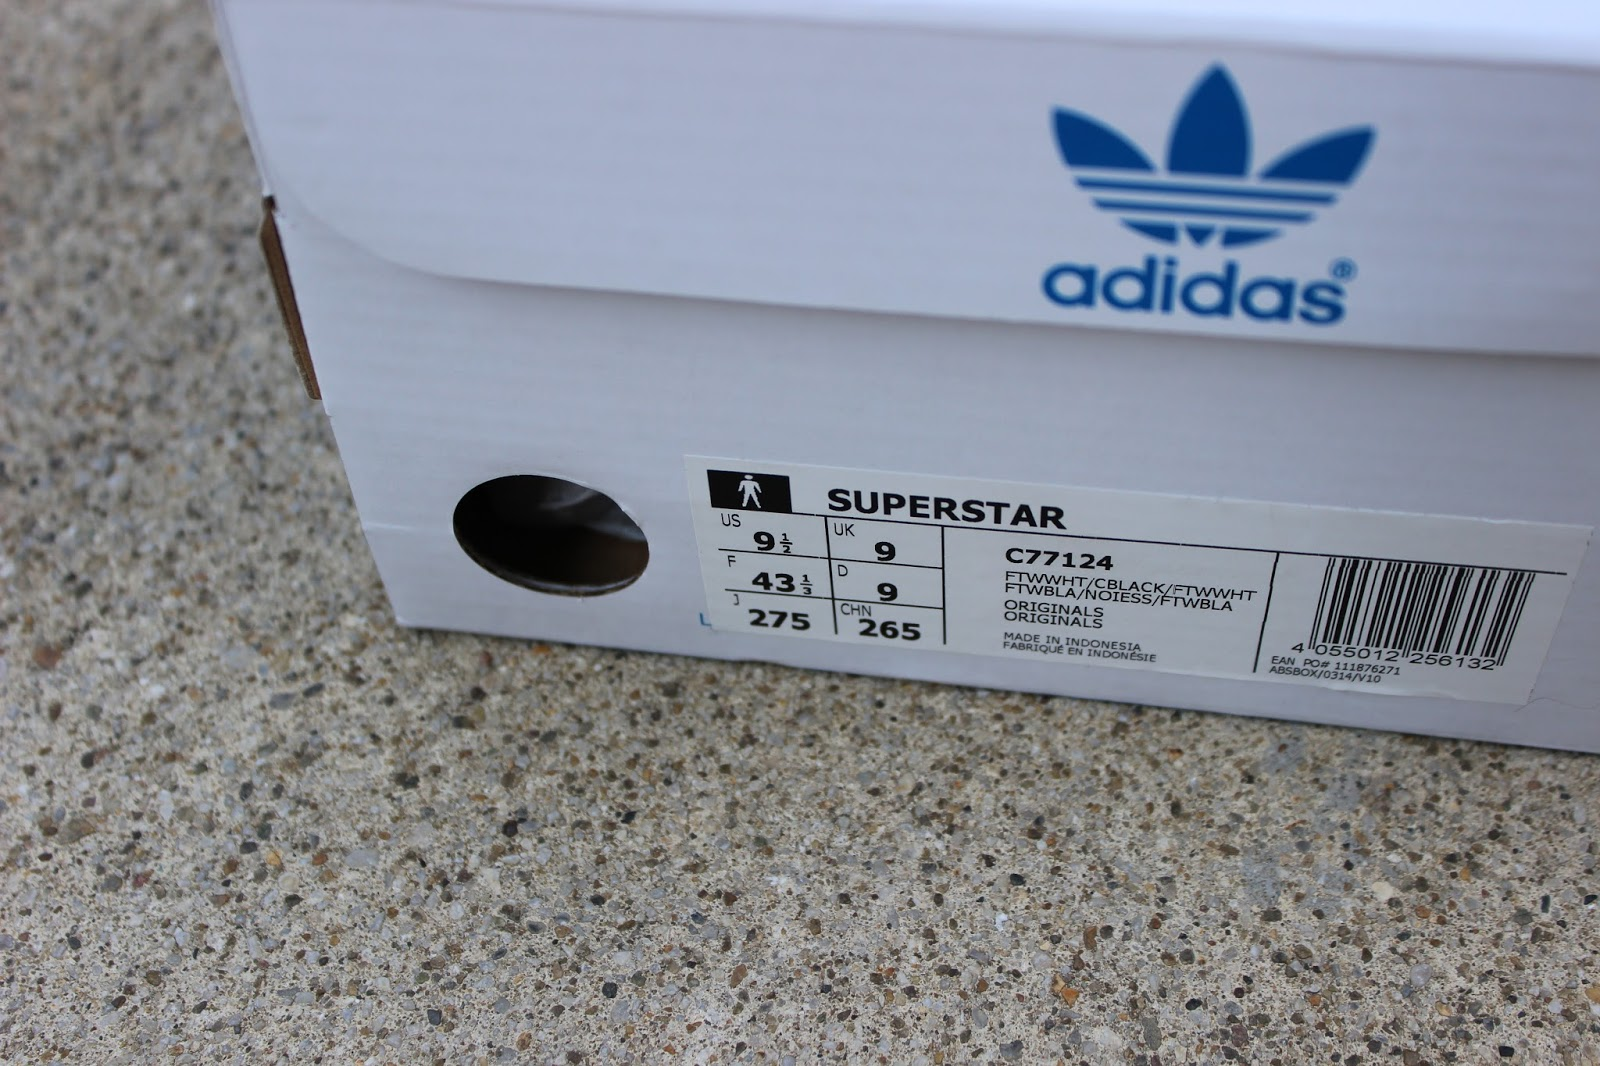 Adidas Superstar Unboxing